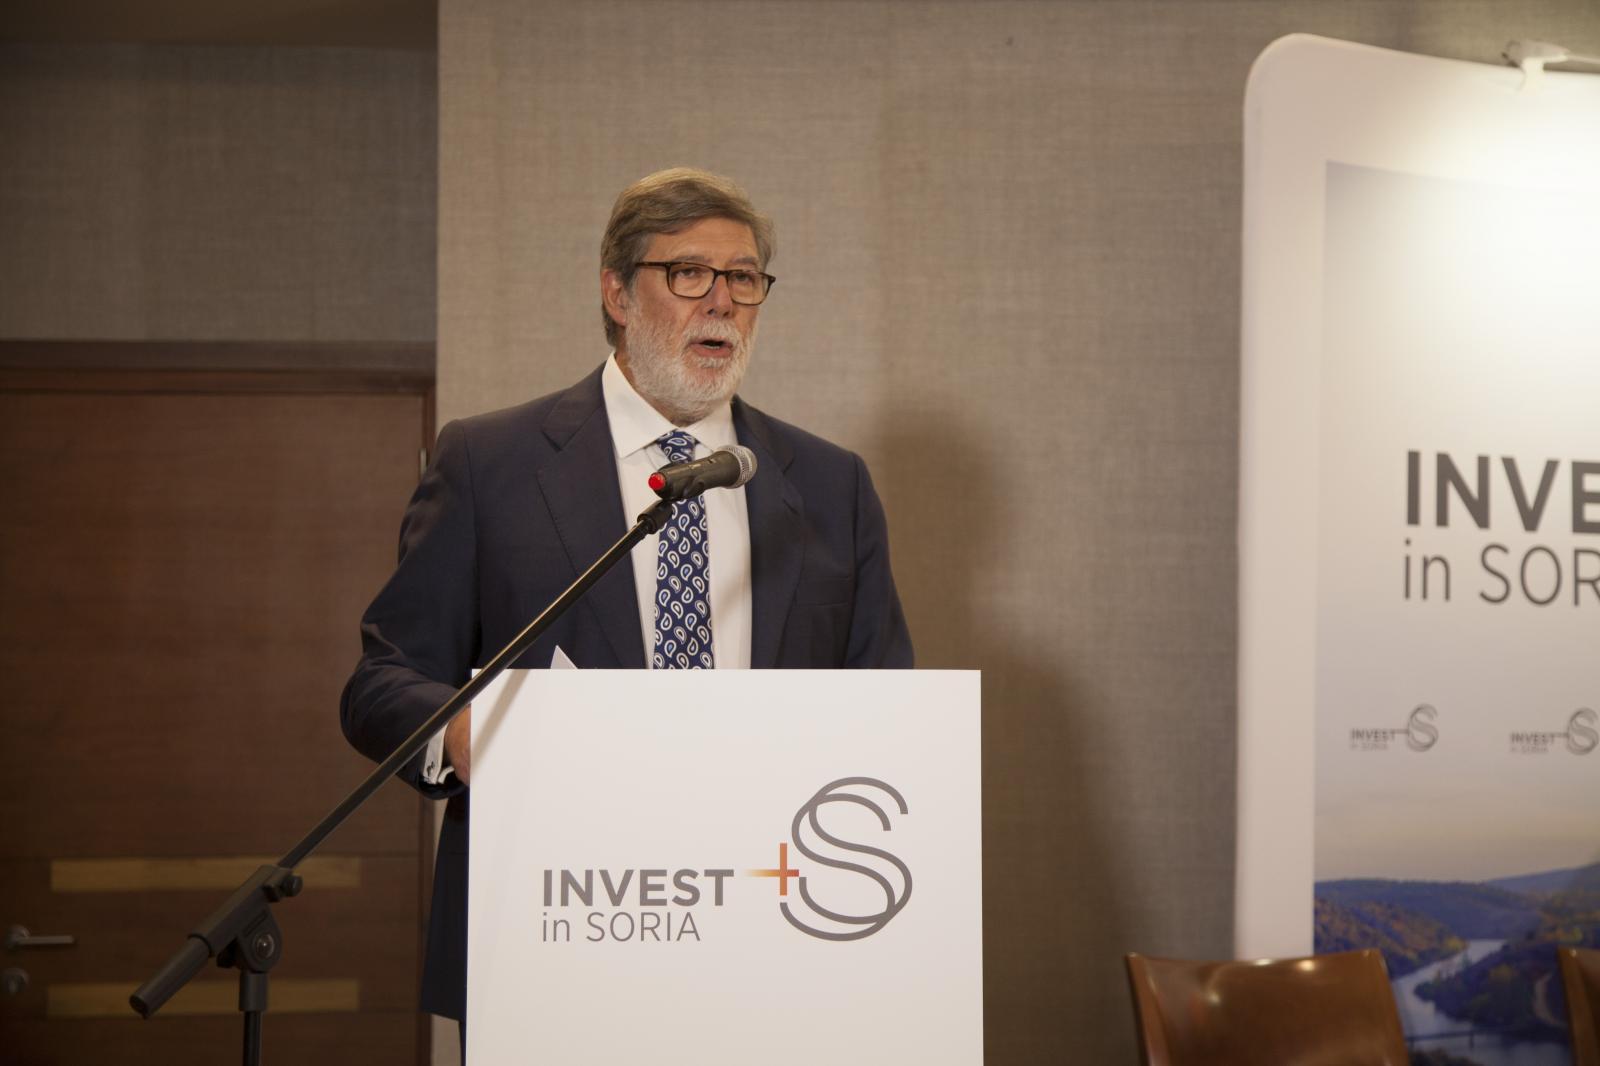 'Invest in Soria' camina acompañado